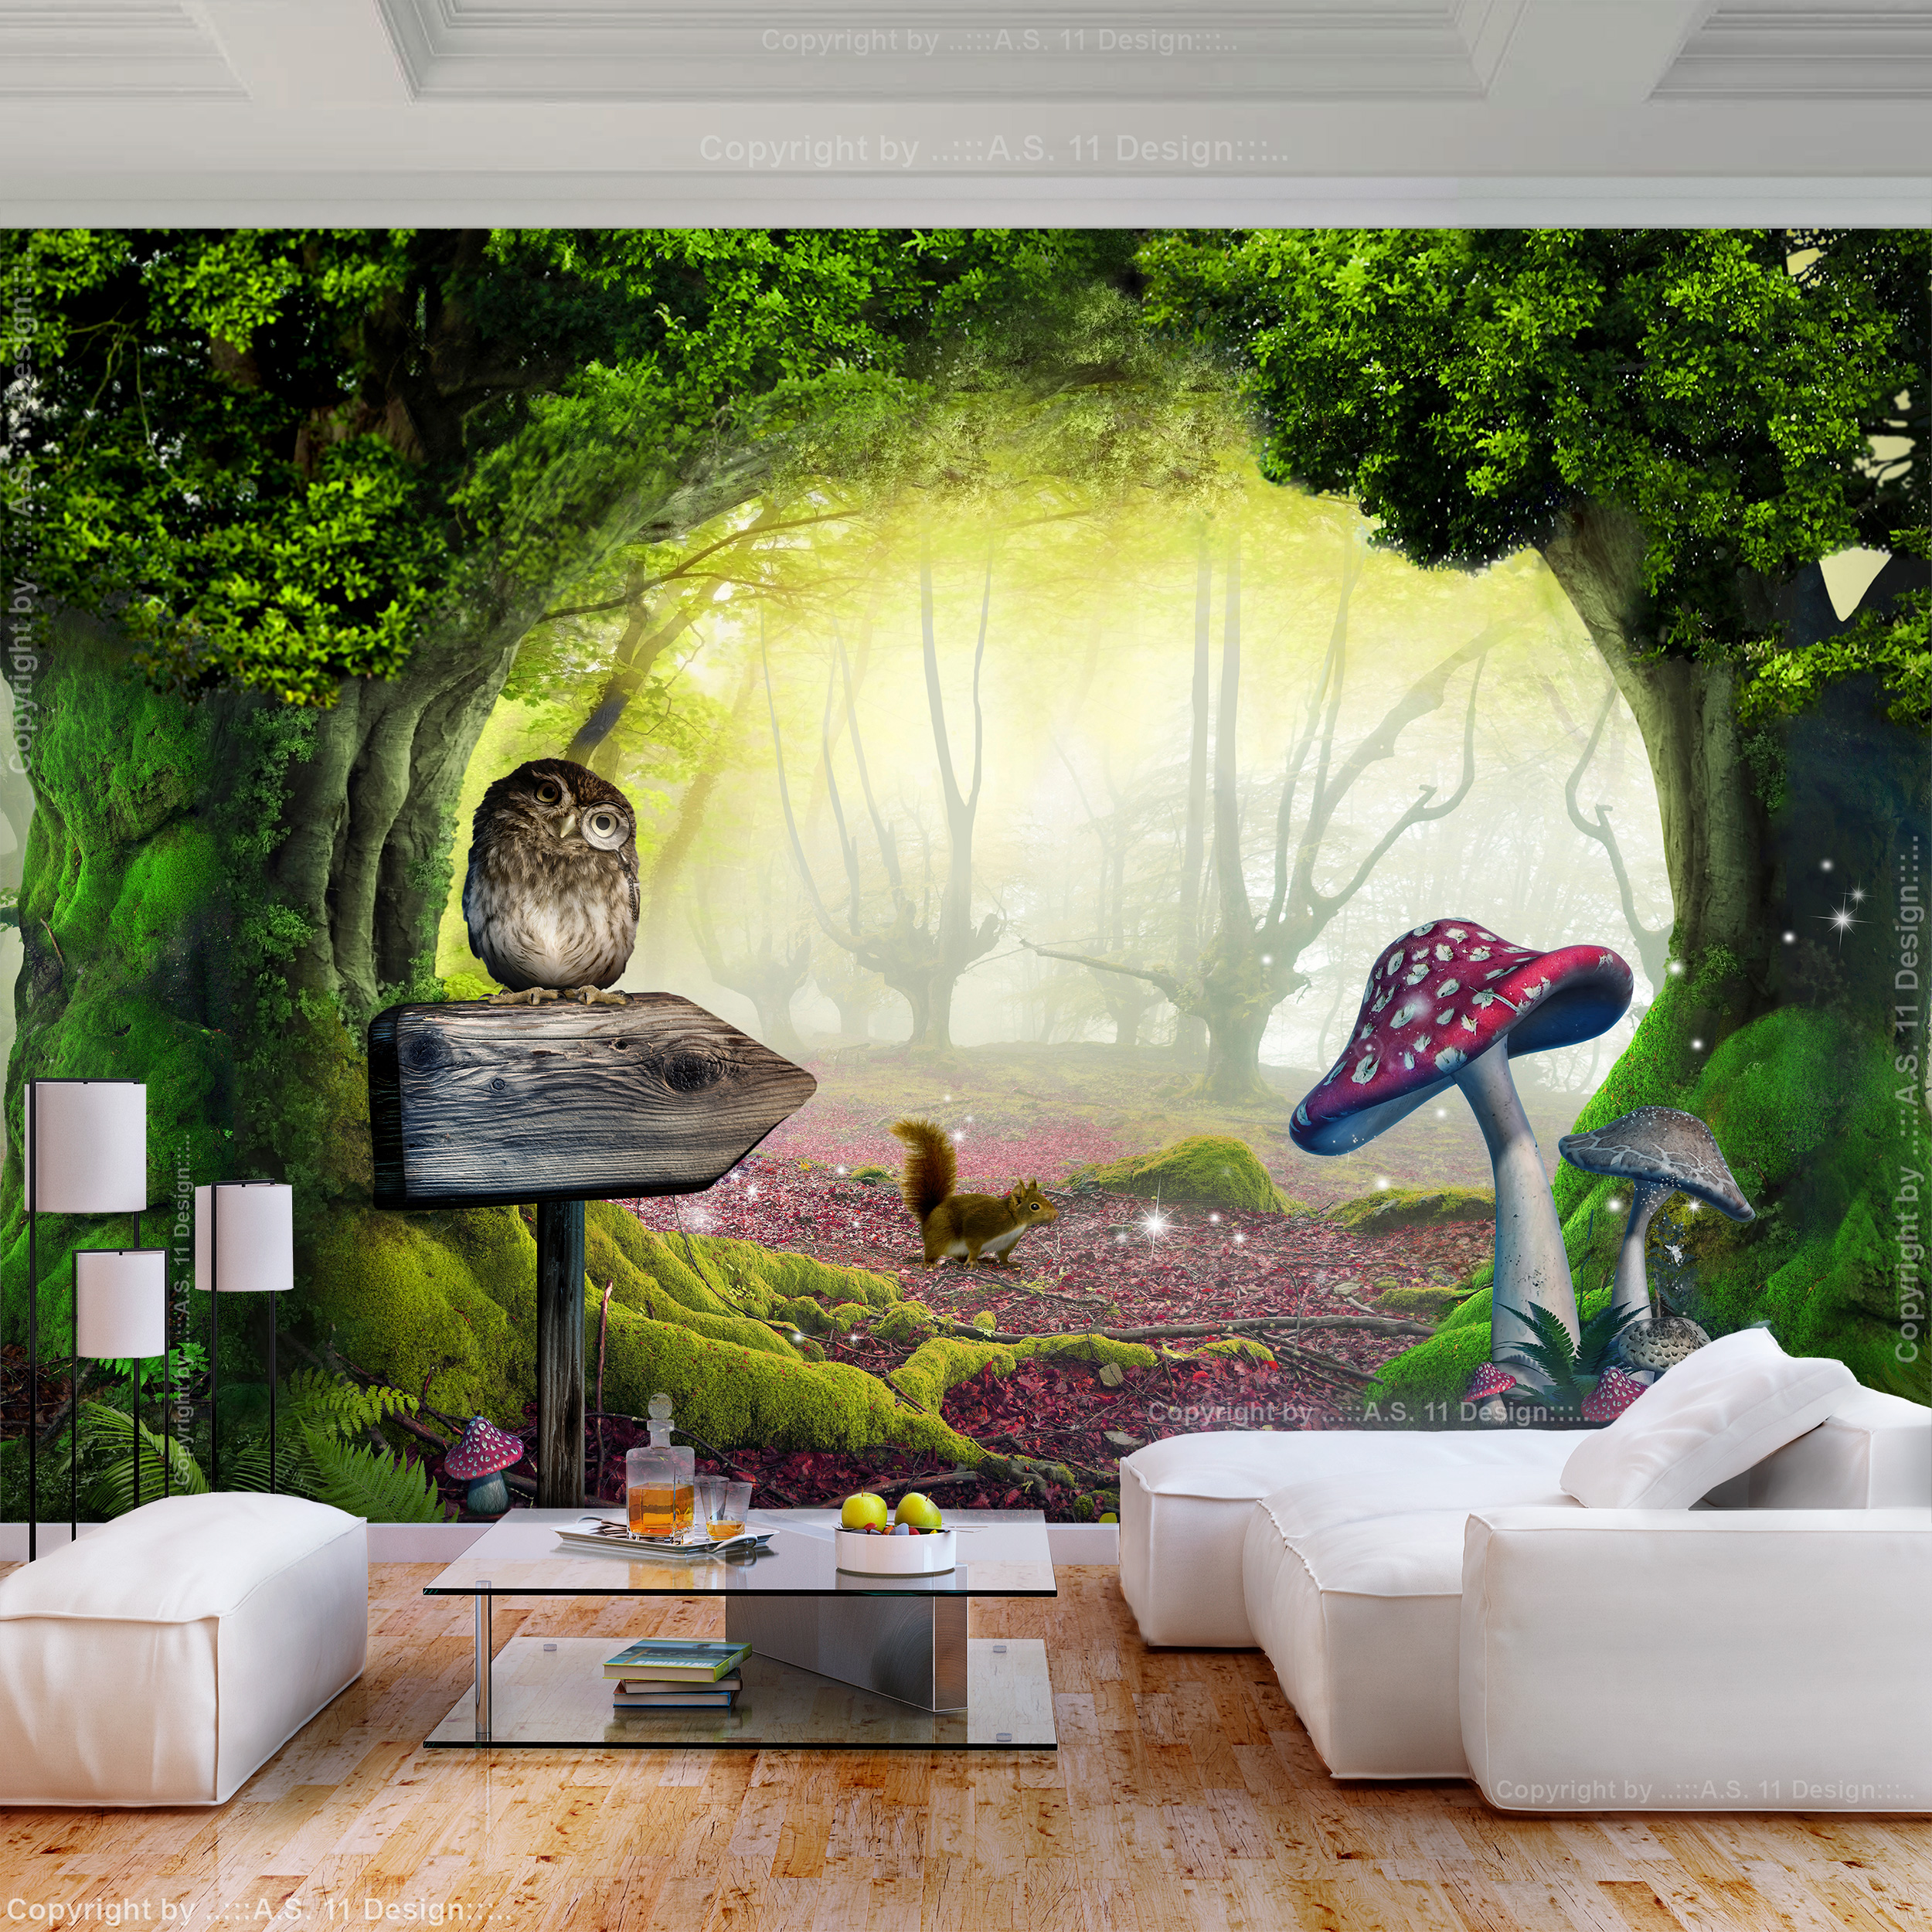 Tapete350x250cm Kinderzimmer Wald 3d Anpassung Wallpaper ...